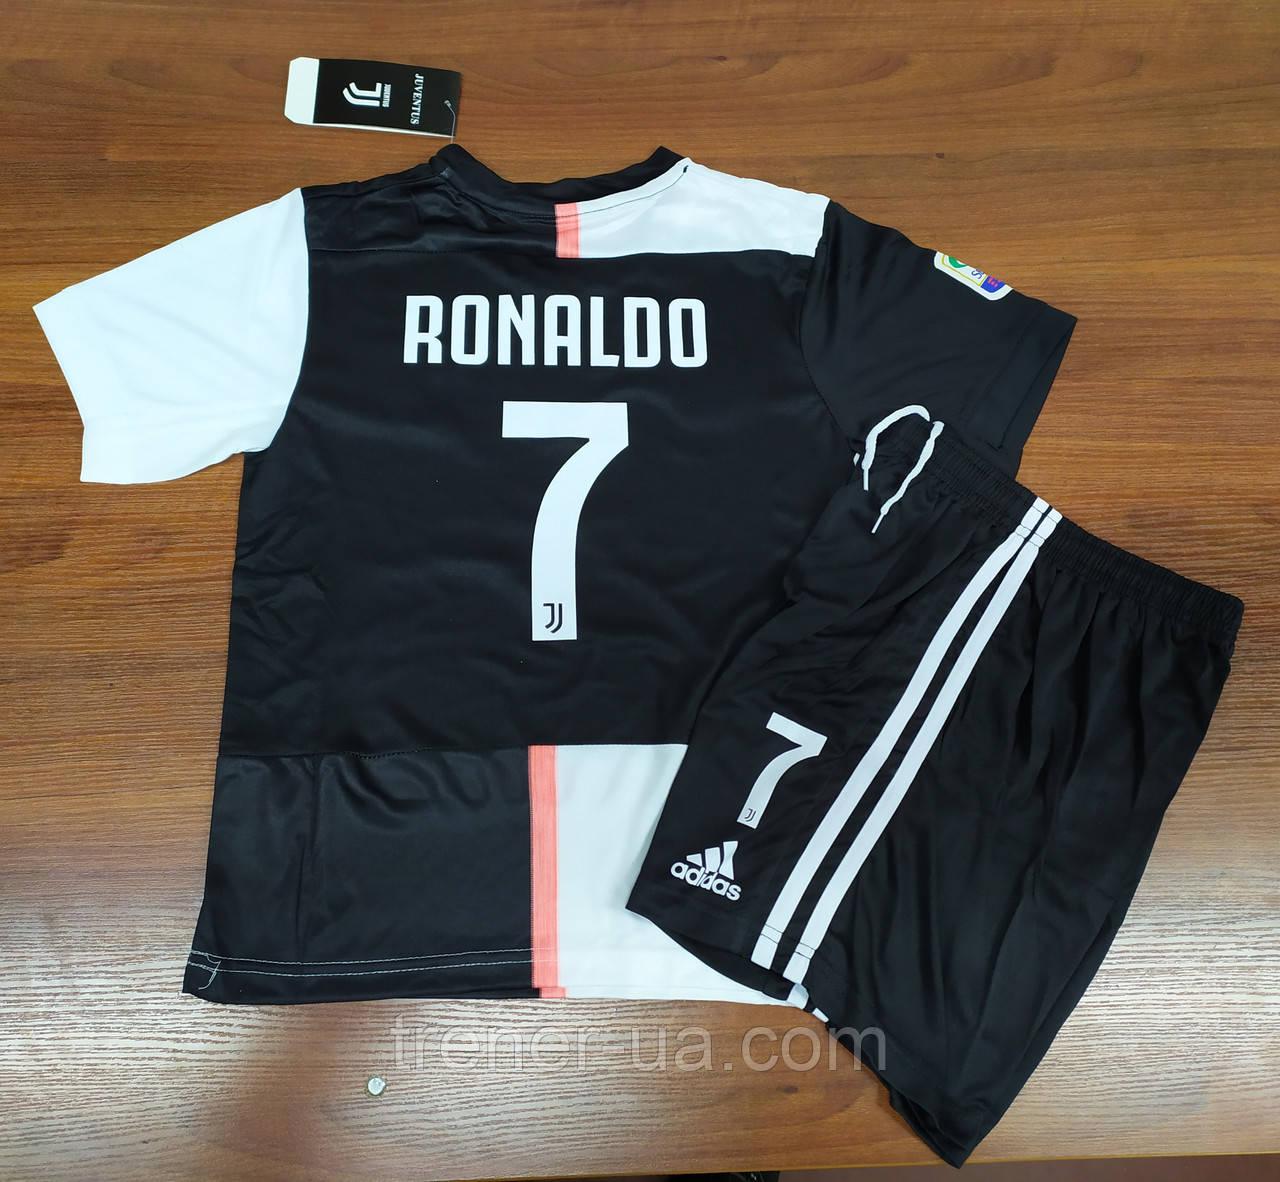 Форма дитяча в стилі Adidas Juventus Ronaldo сезон 2019-20 чорно-біла